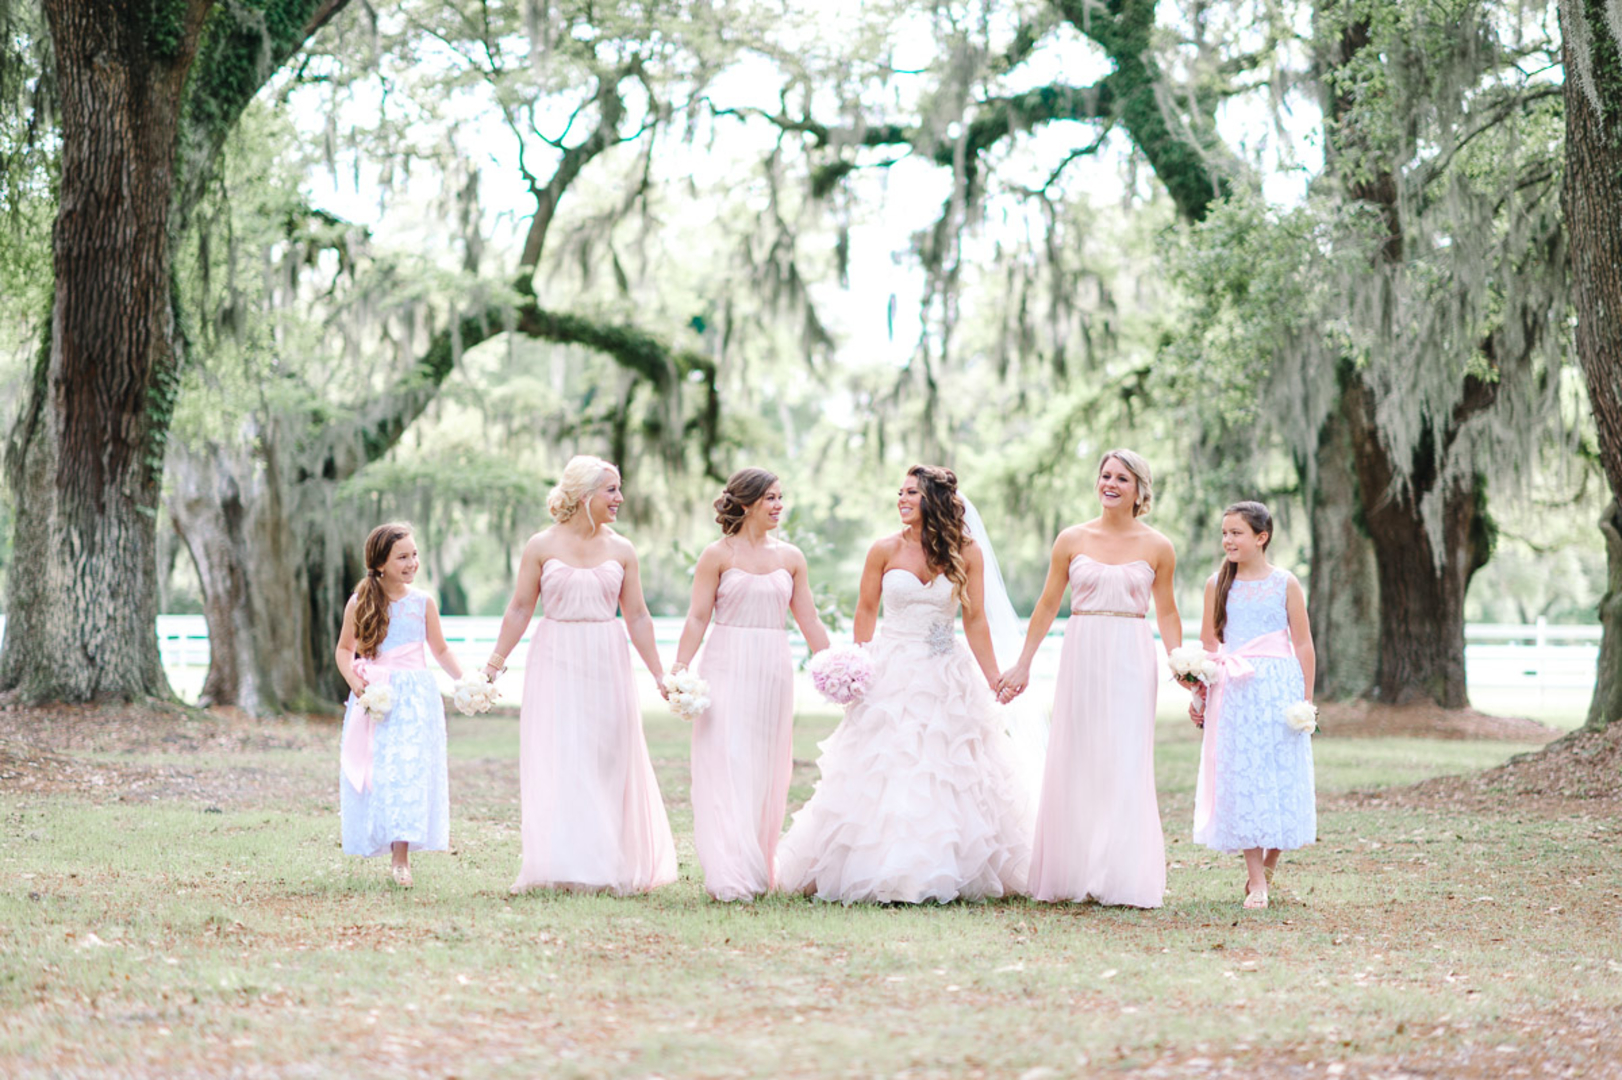 mansfield-plantation-wedding-11.jpg